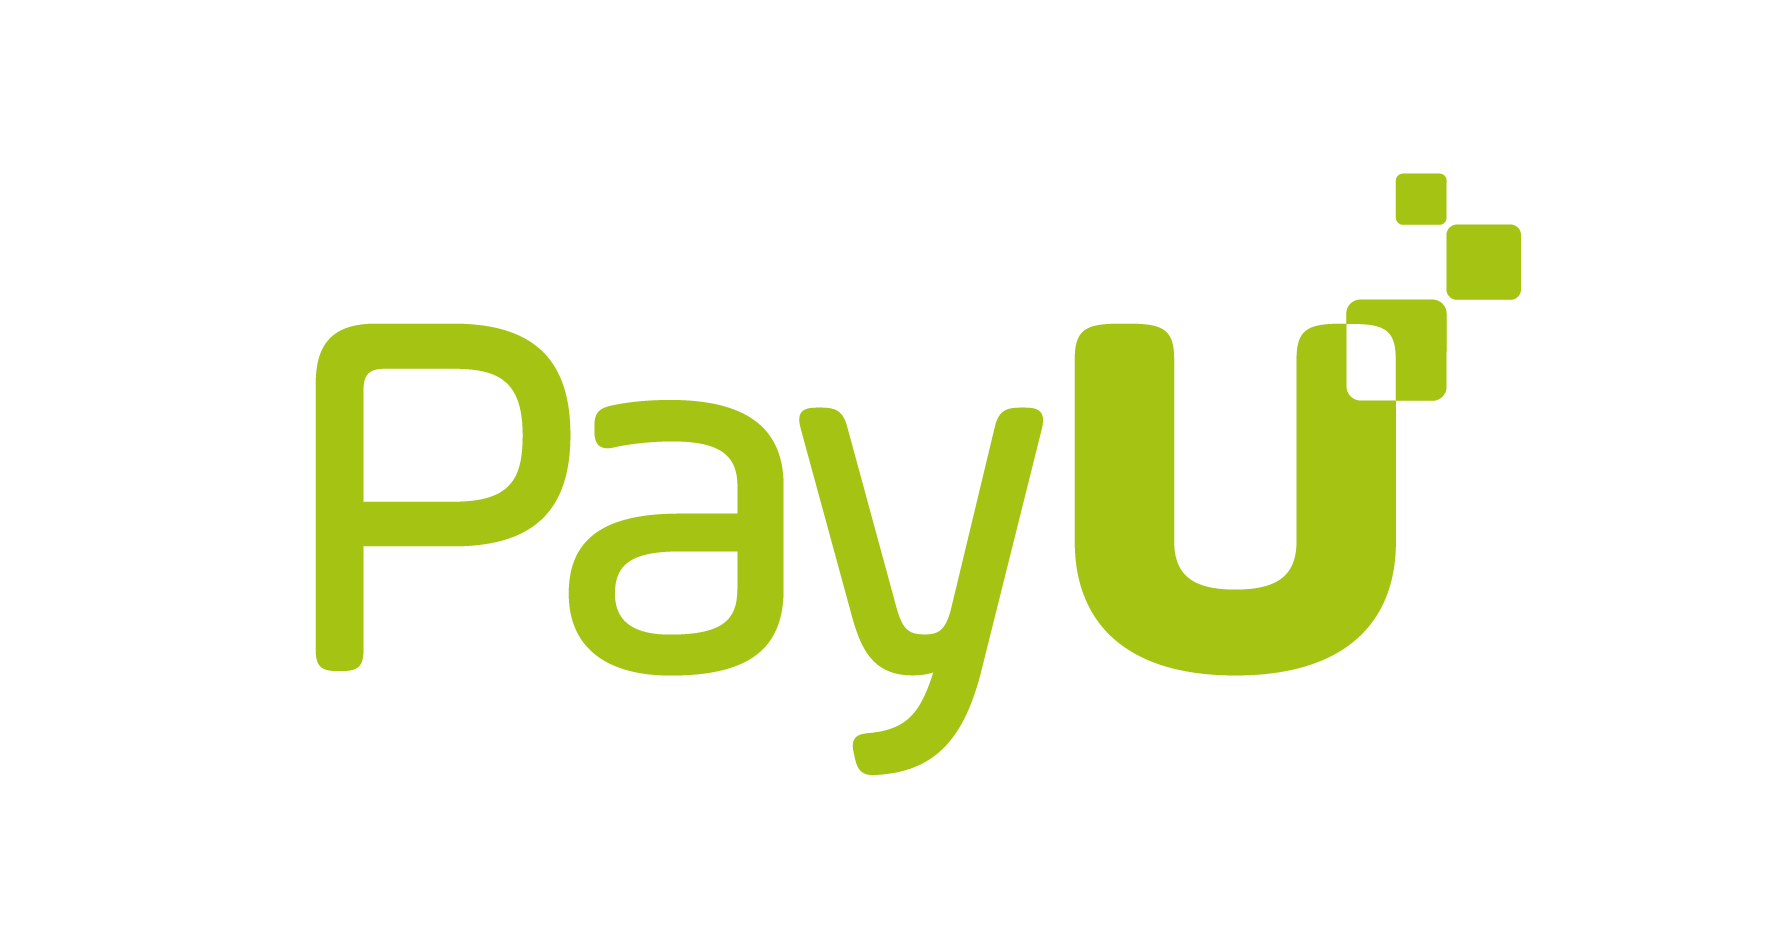 BPU Horeca contamos con payu como medio de pago